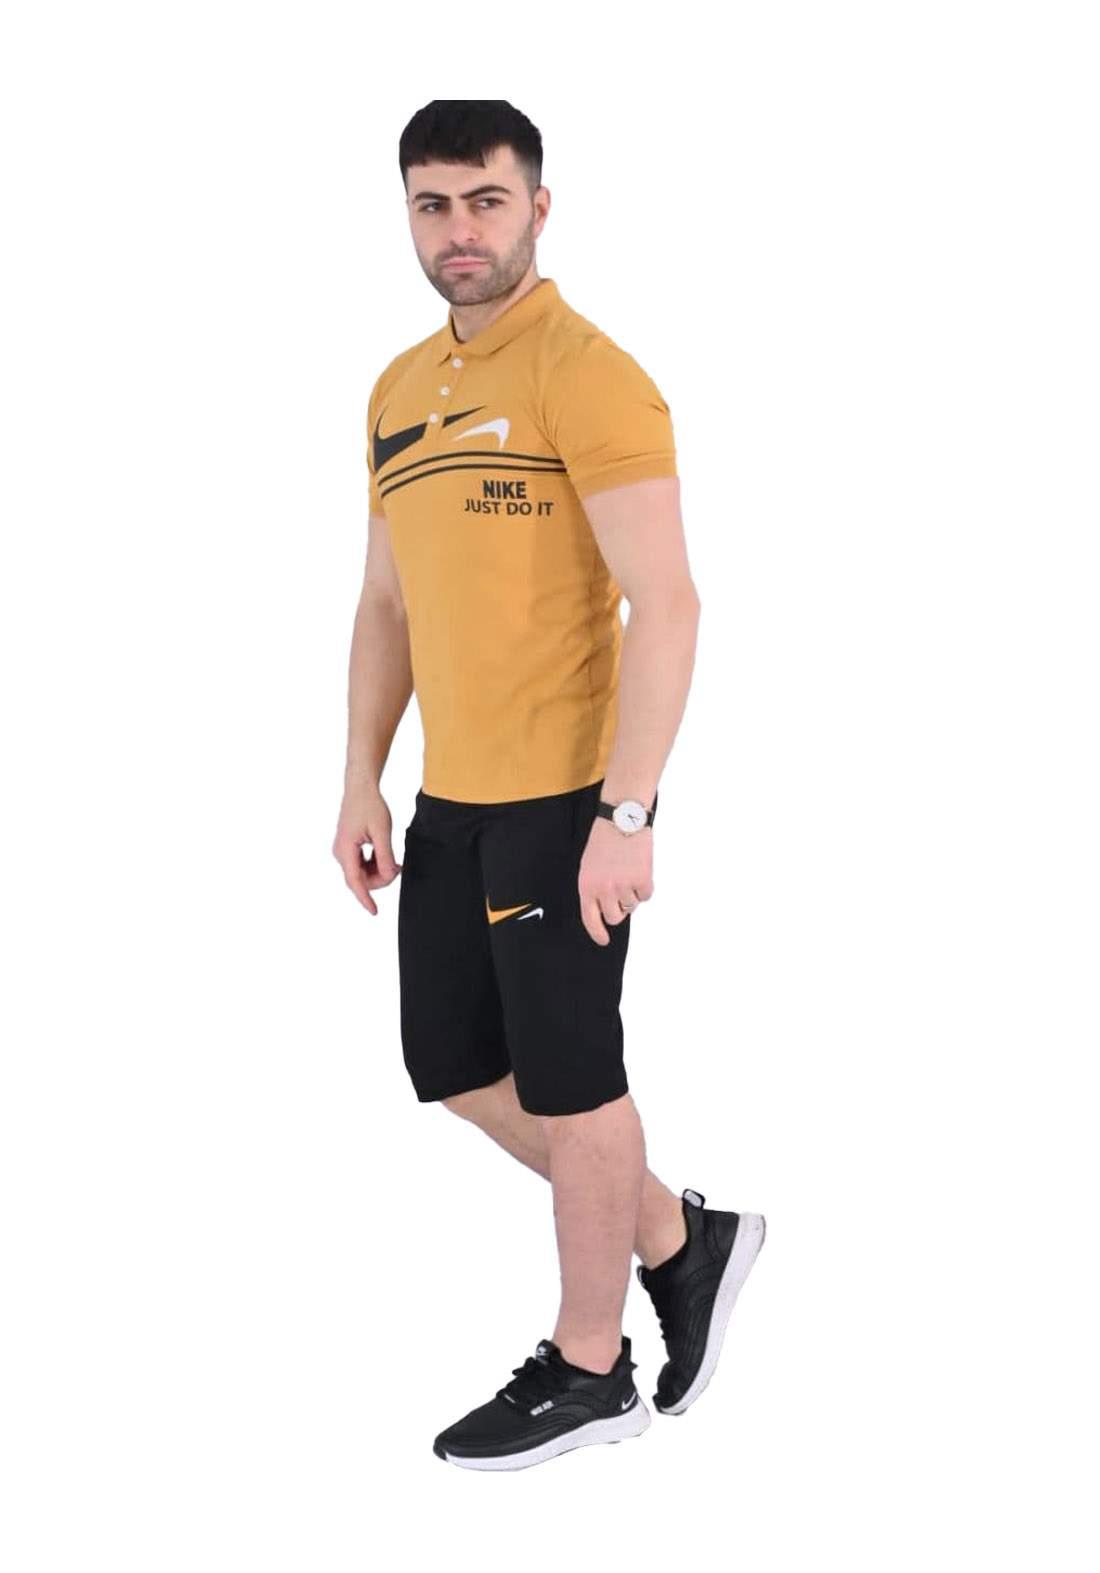 Nike Sportswear تراكسوت رجالي اصفر  اللون